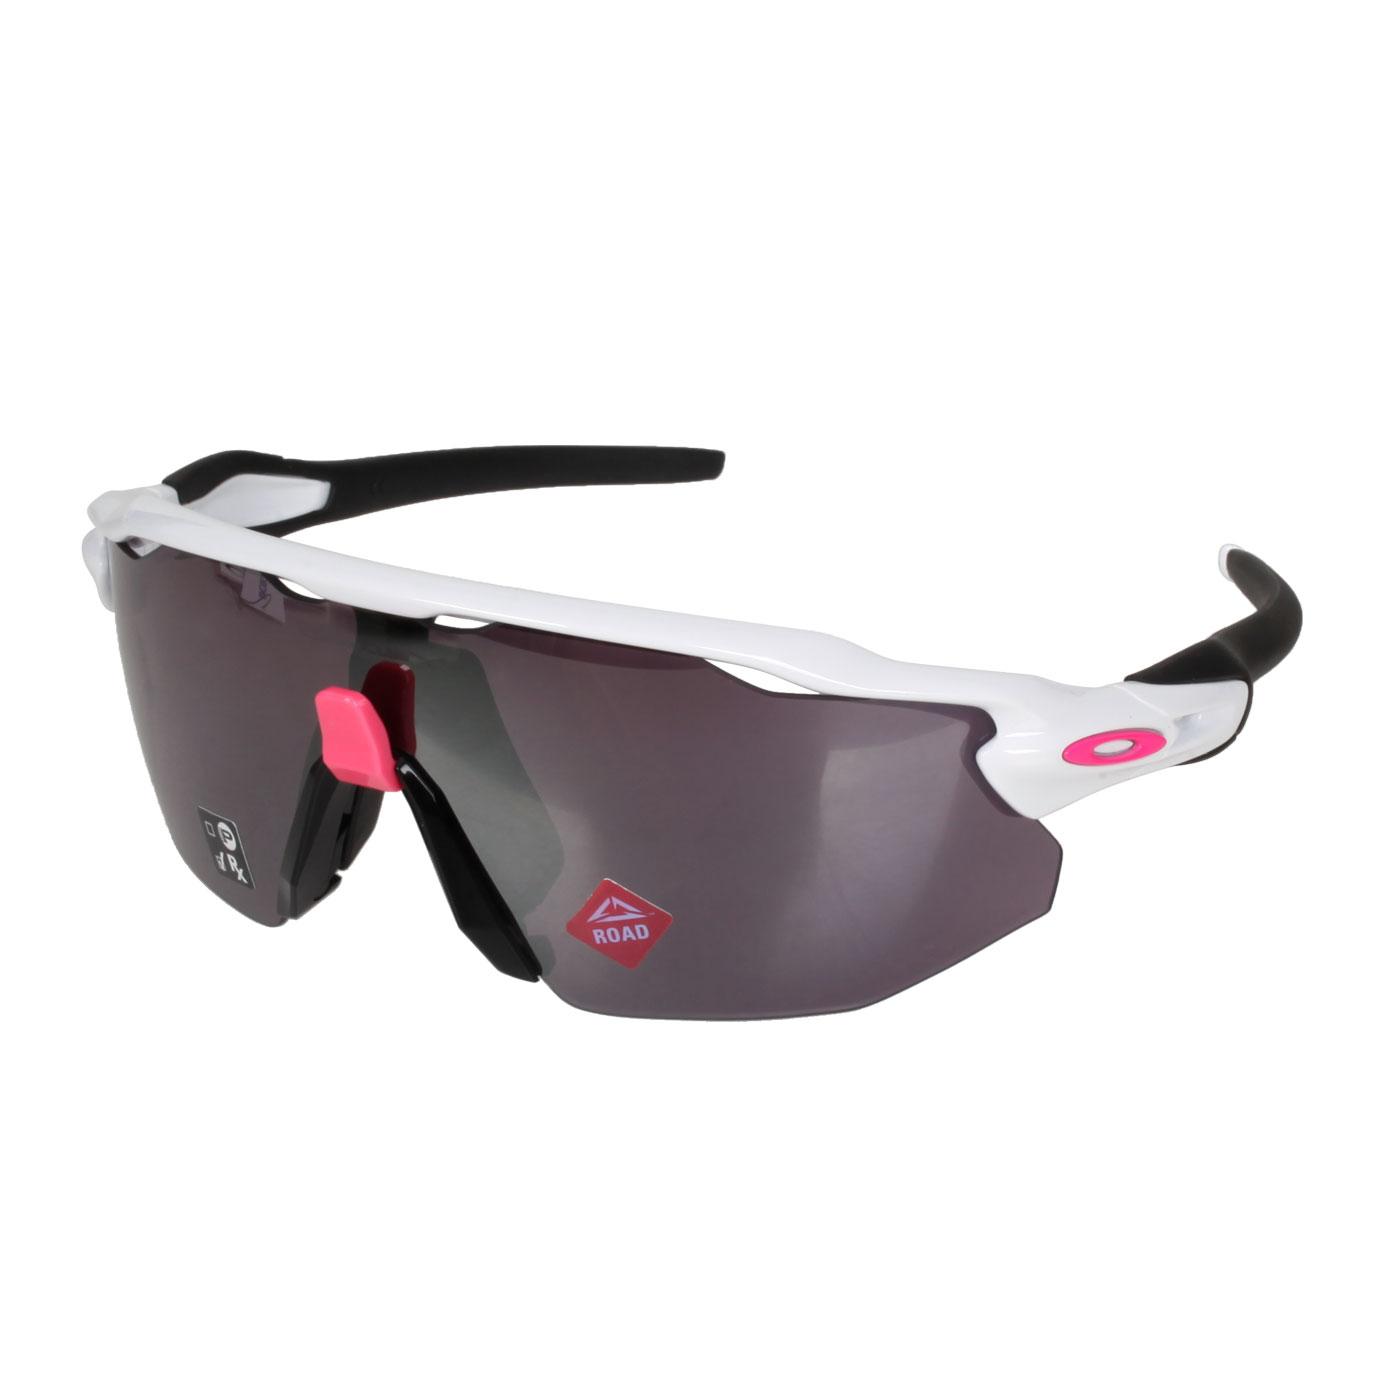 OAKLEY RADAR EV ADVANCER 一般太陽眼鏡 (附硬盒鼻墊) OAK-OO9442-0438